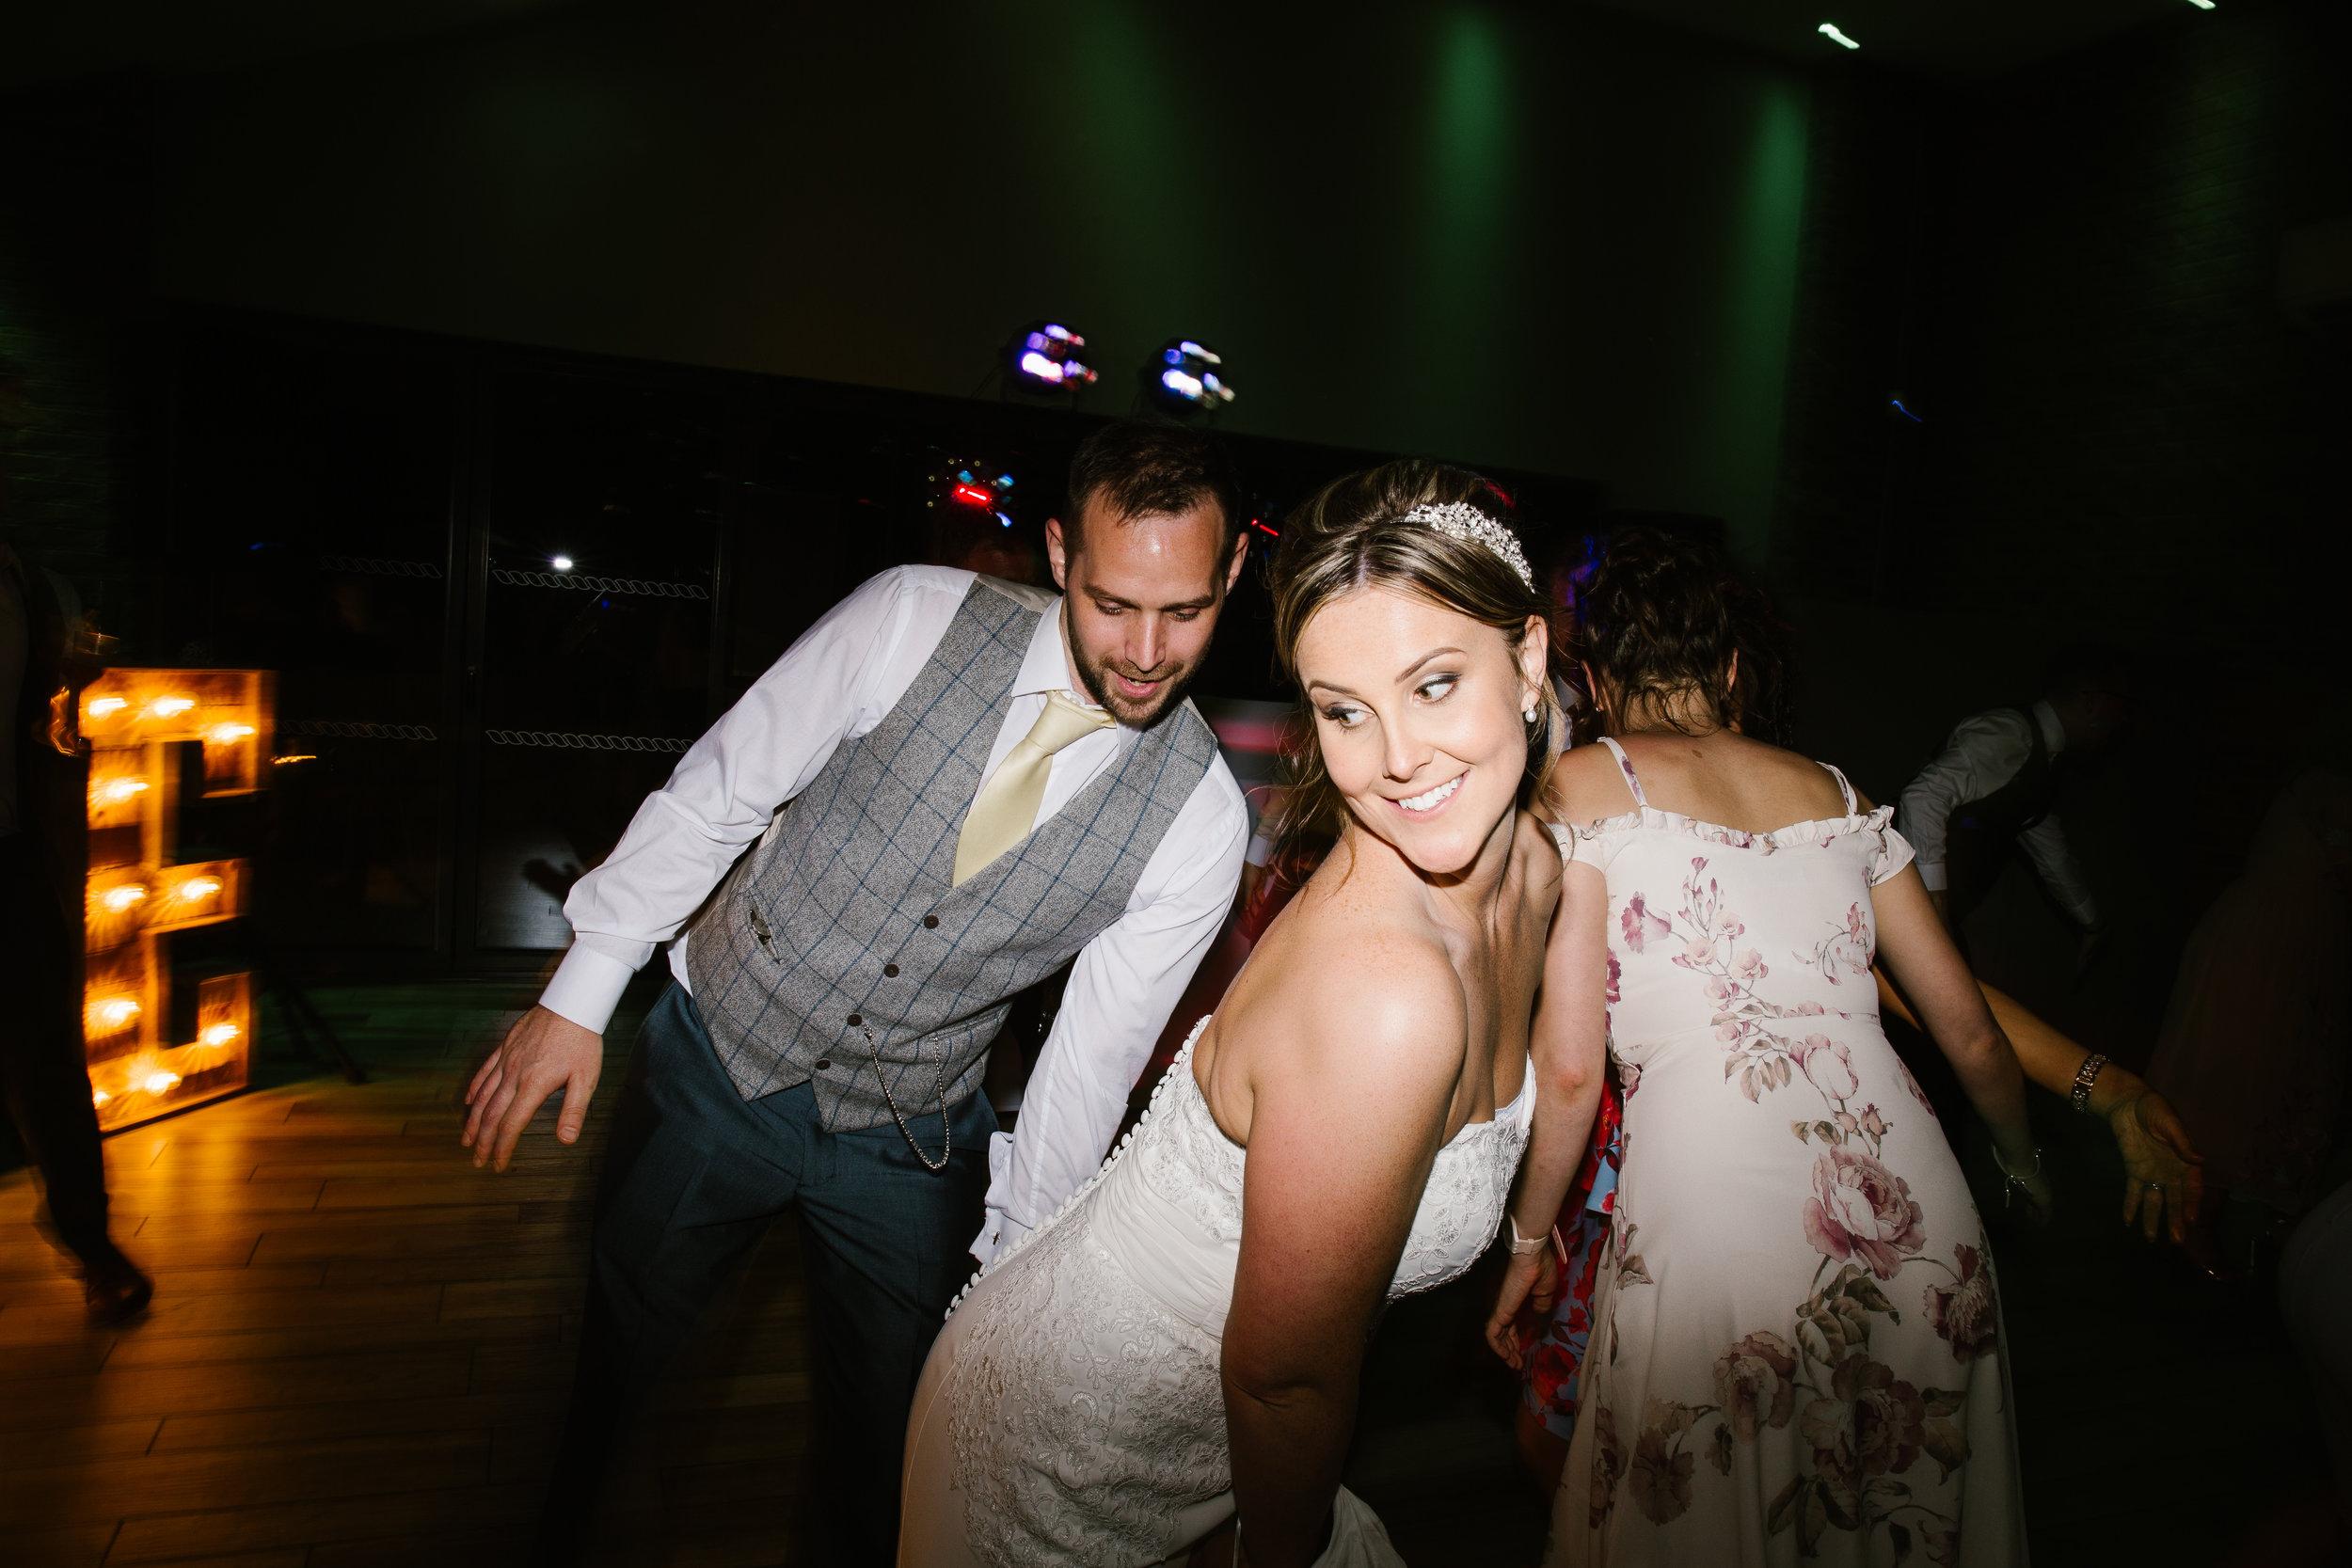 bride and groom being seductive on the dance floor